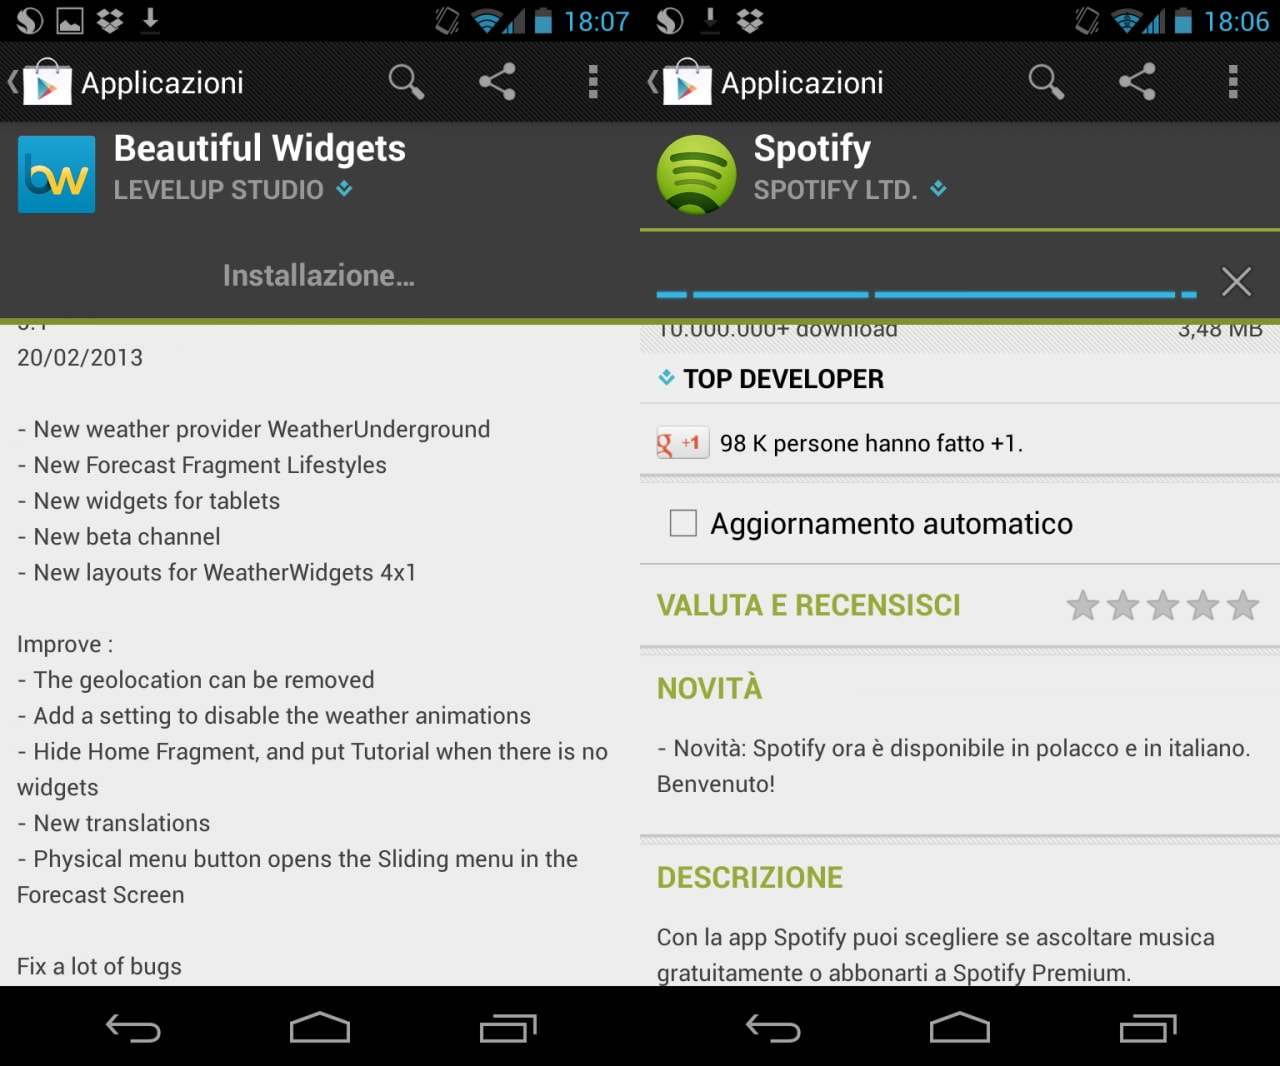 Screenshot_2013-02-20-18-06-50